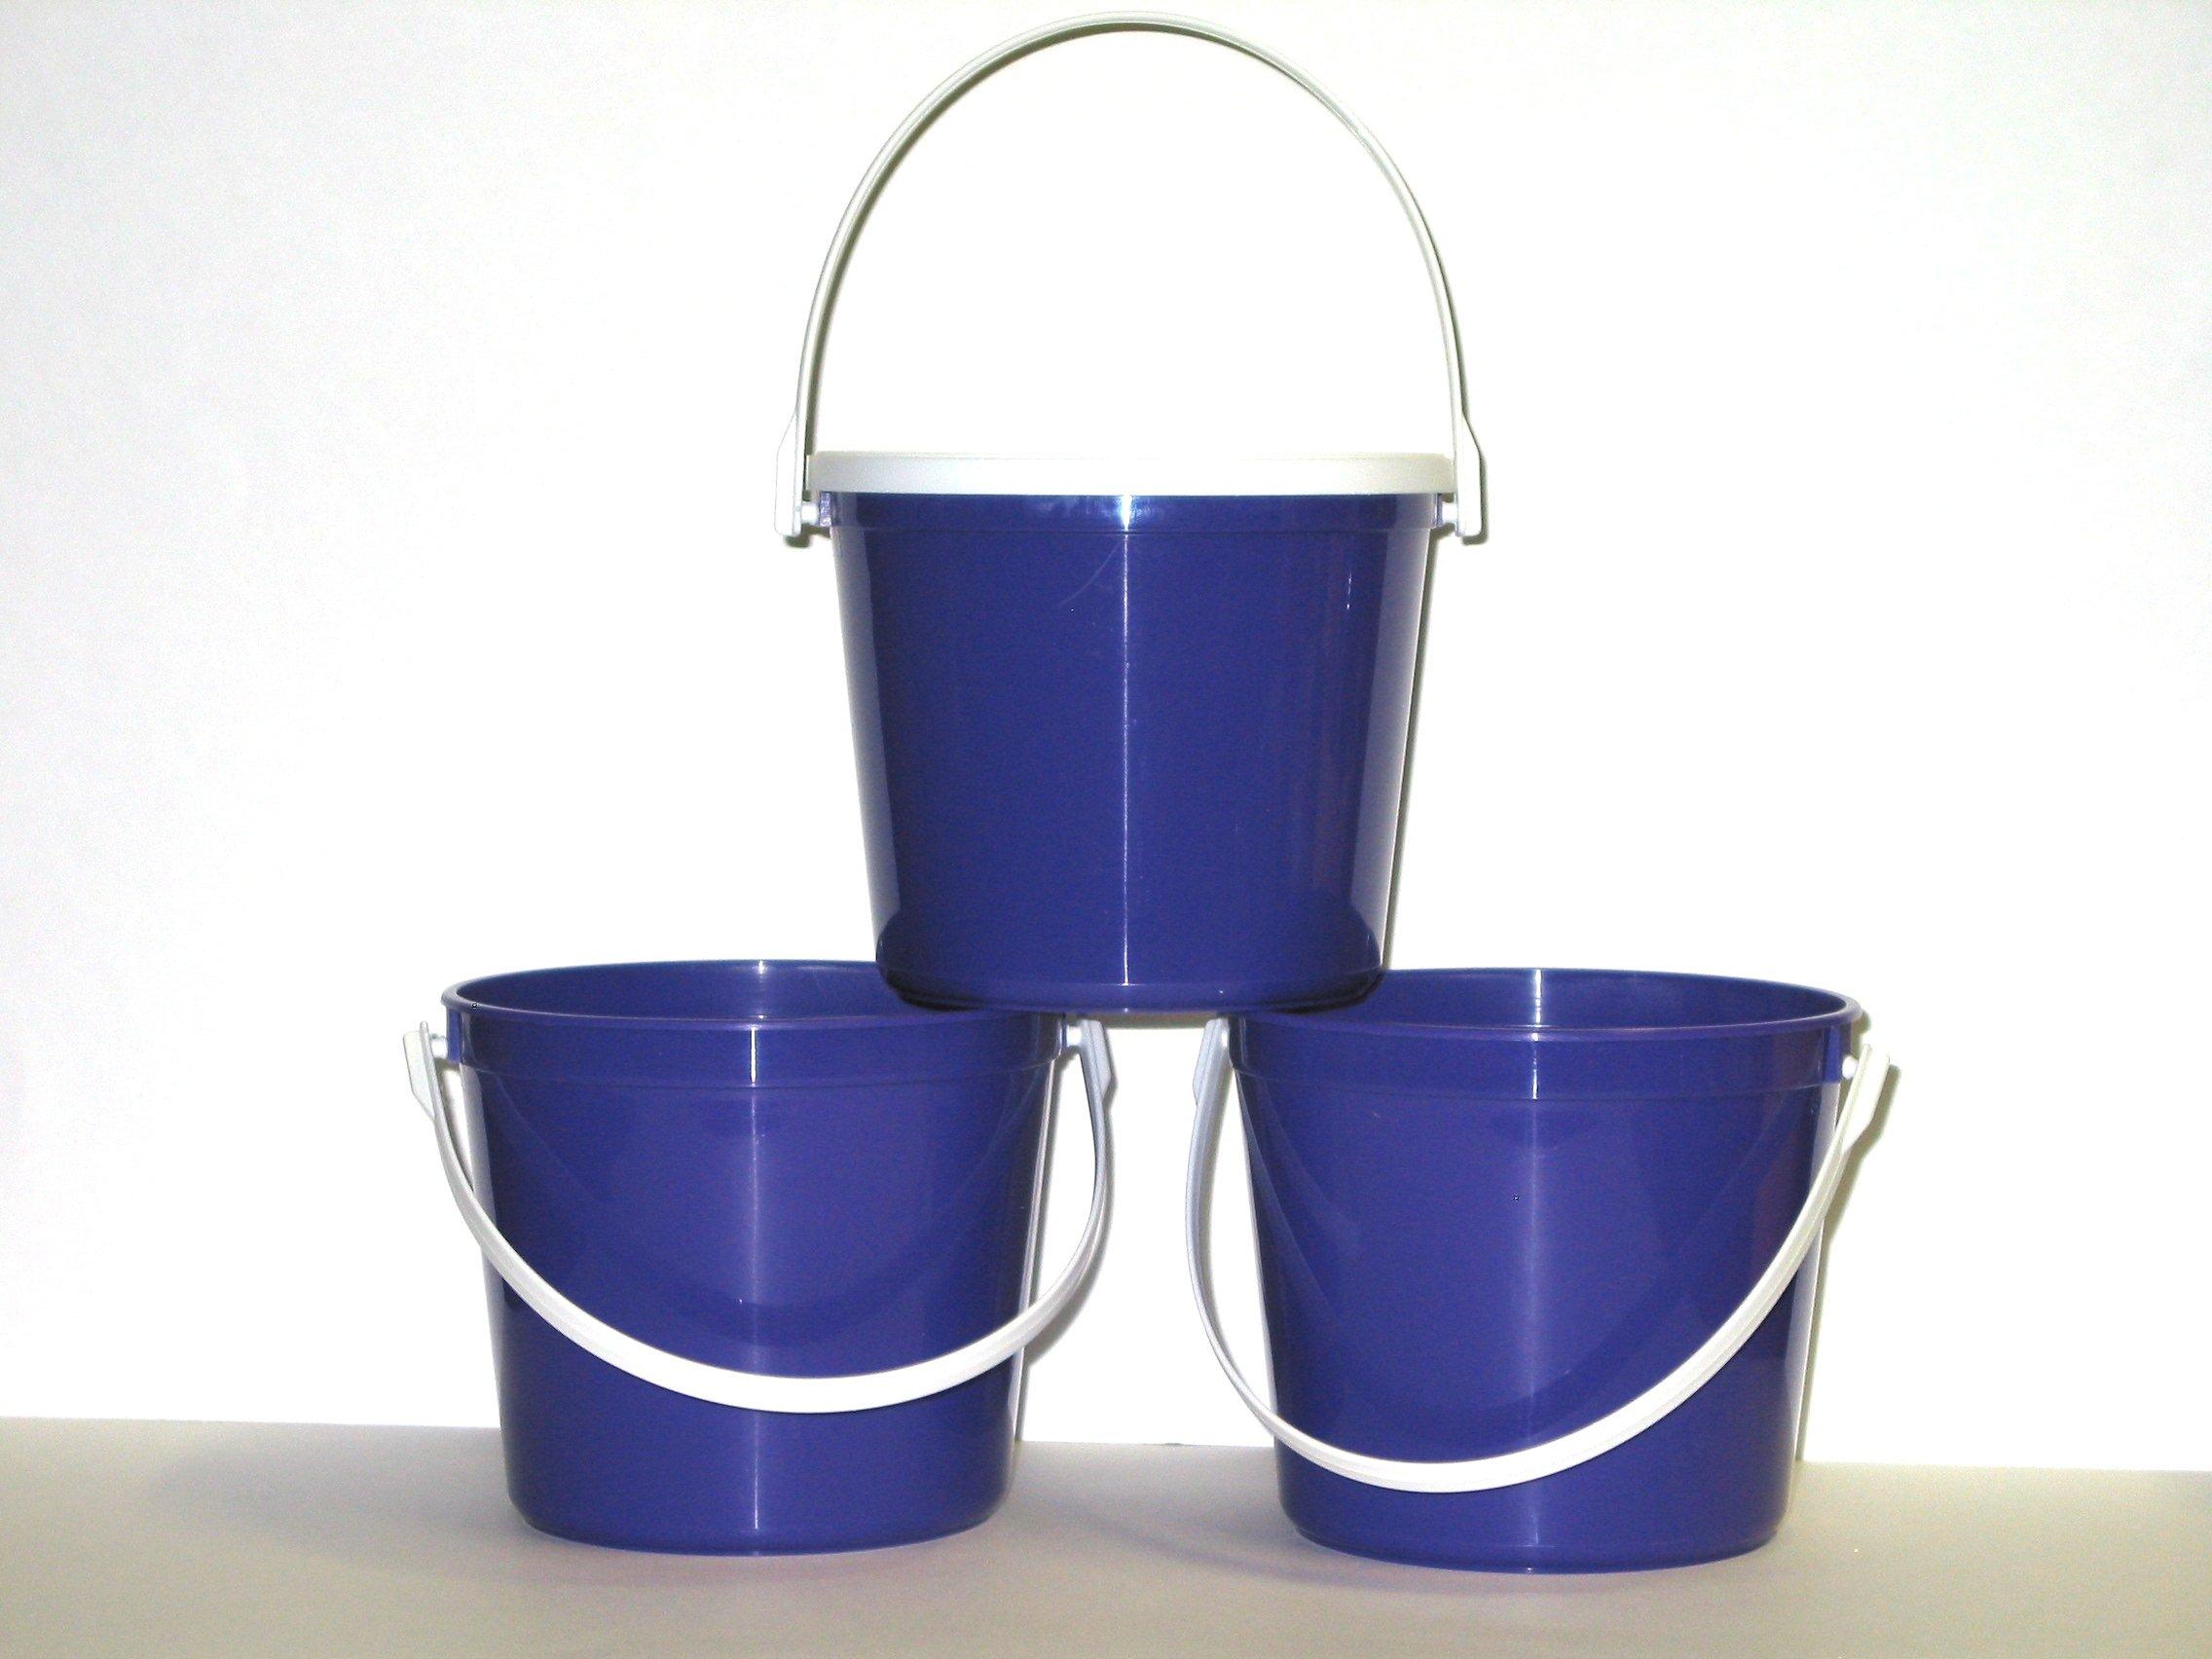 Talisman, Plastic Buckets & Lids, 80 Ounces, 3 Pack, Purple by Talisman (Image #3)